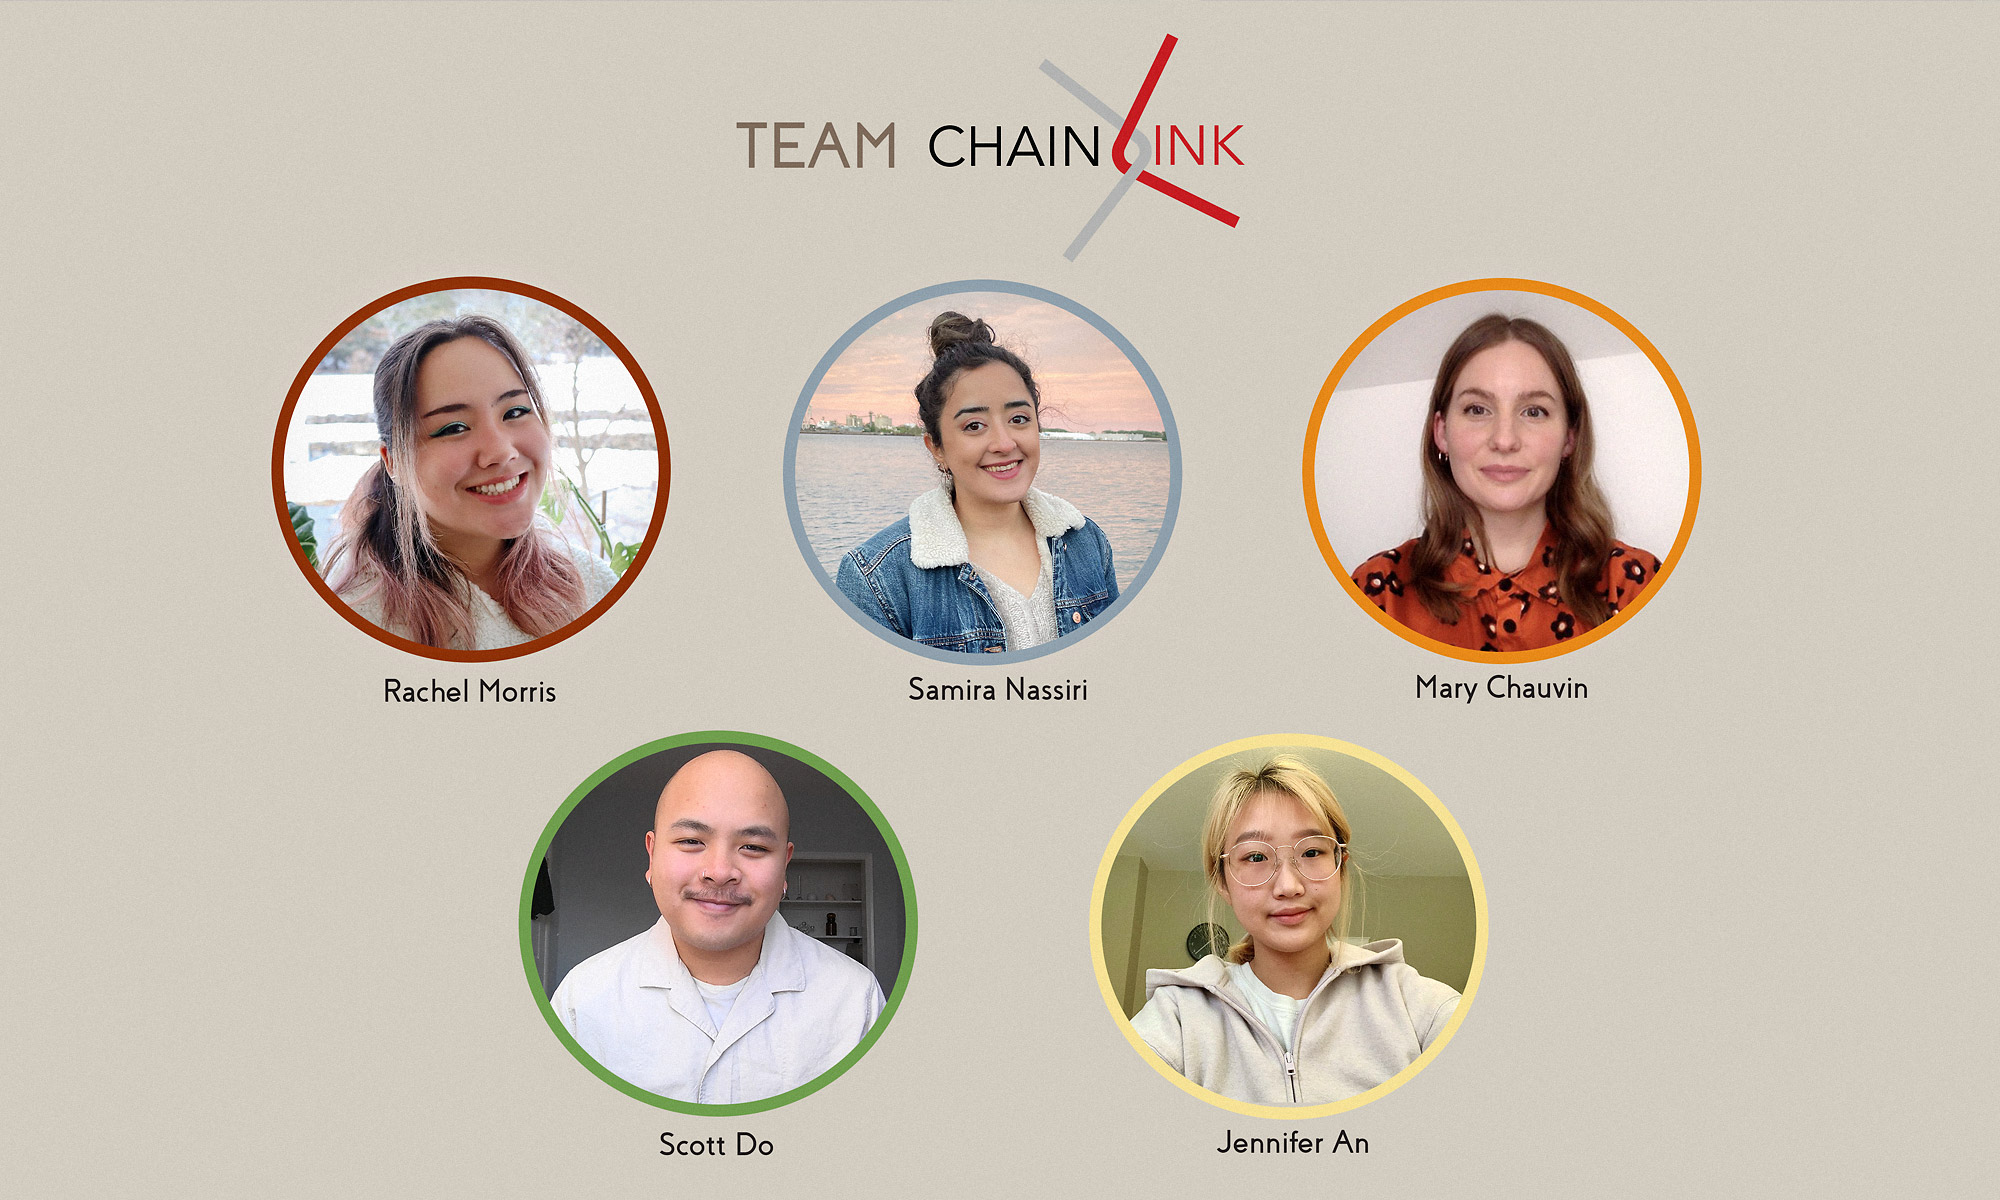 SSDC2021_chain_link_team